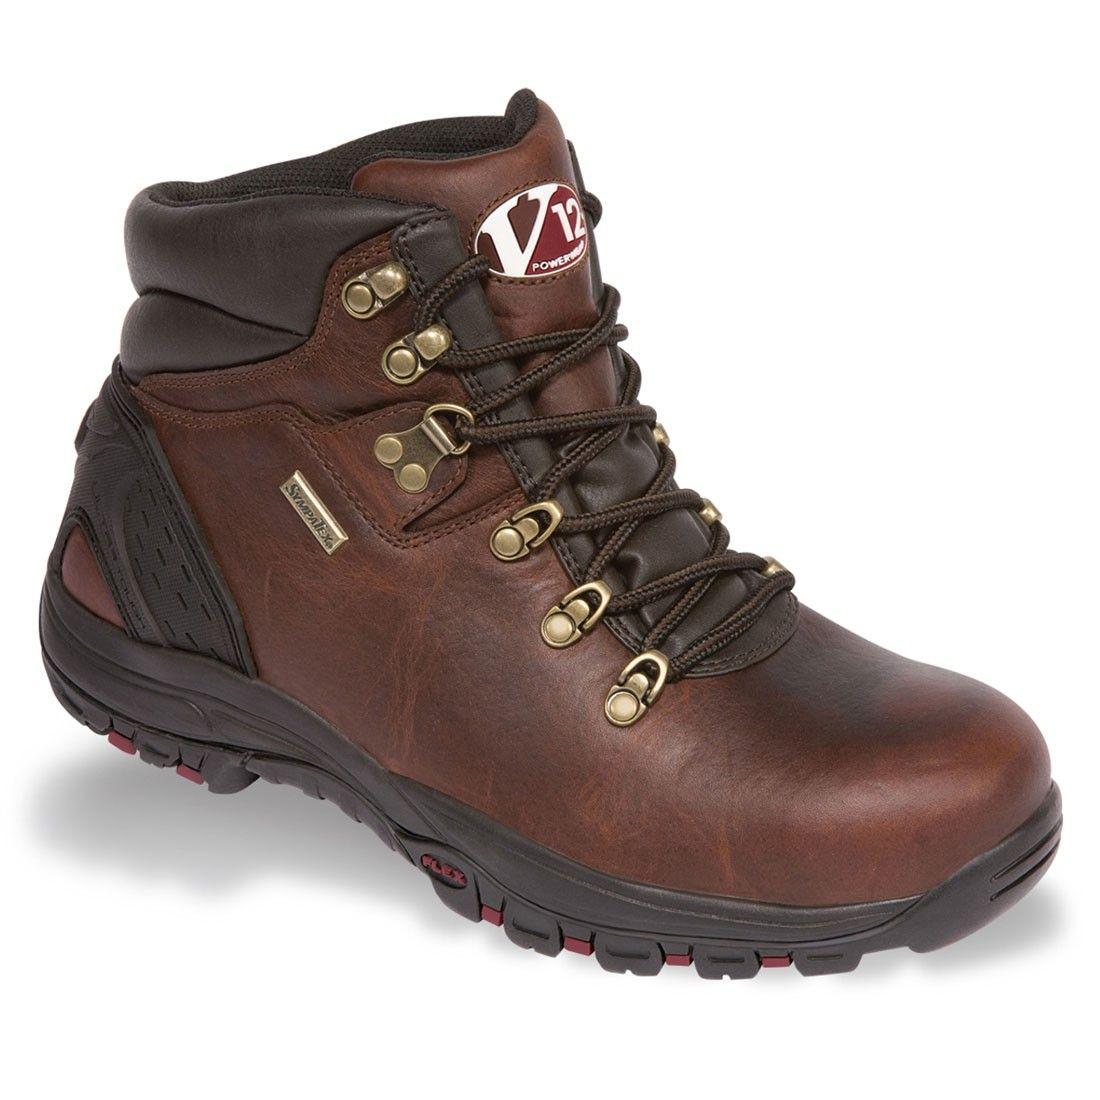 V12 Footwear Storm Premium Vintage Brown Leather S3